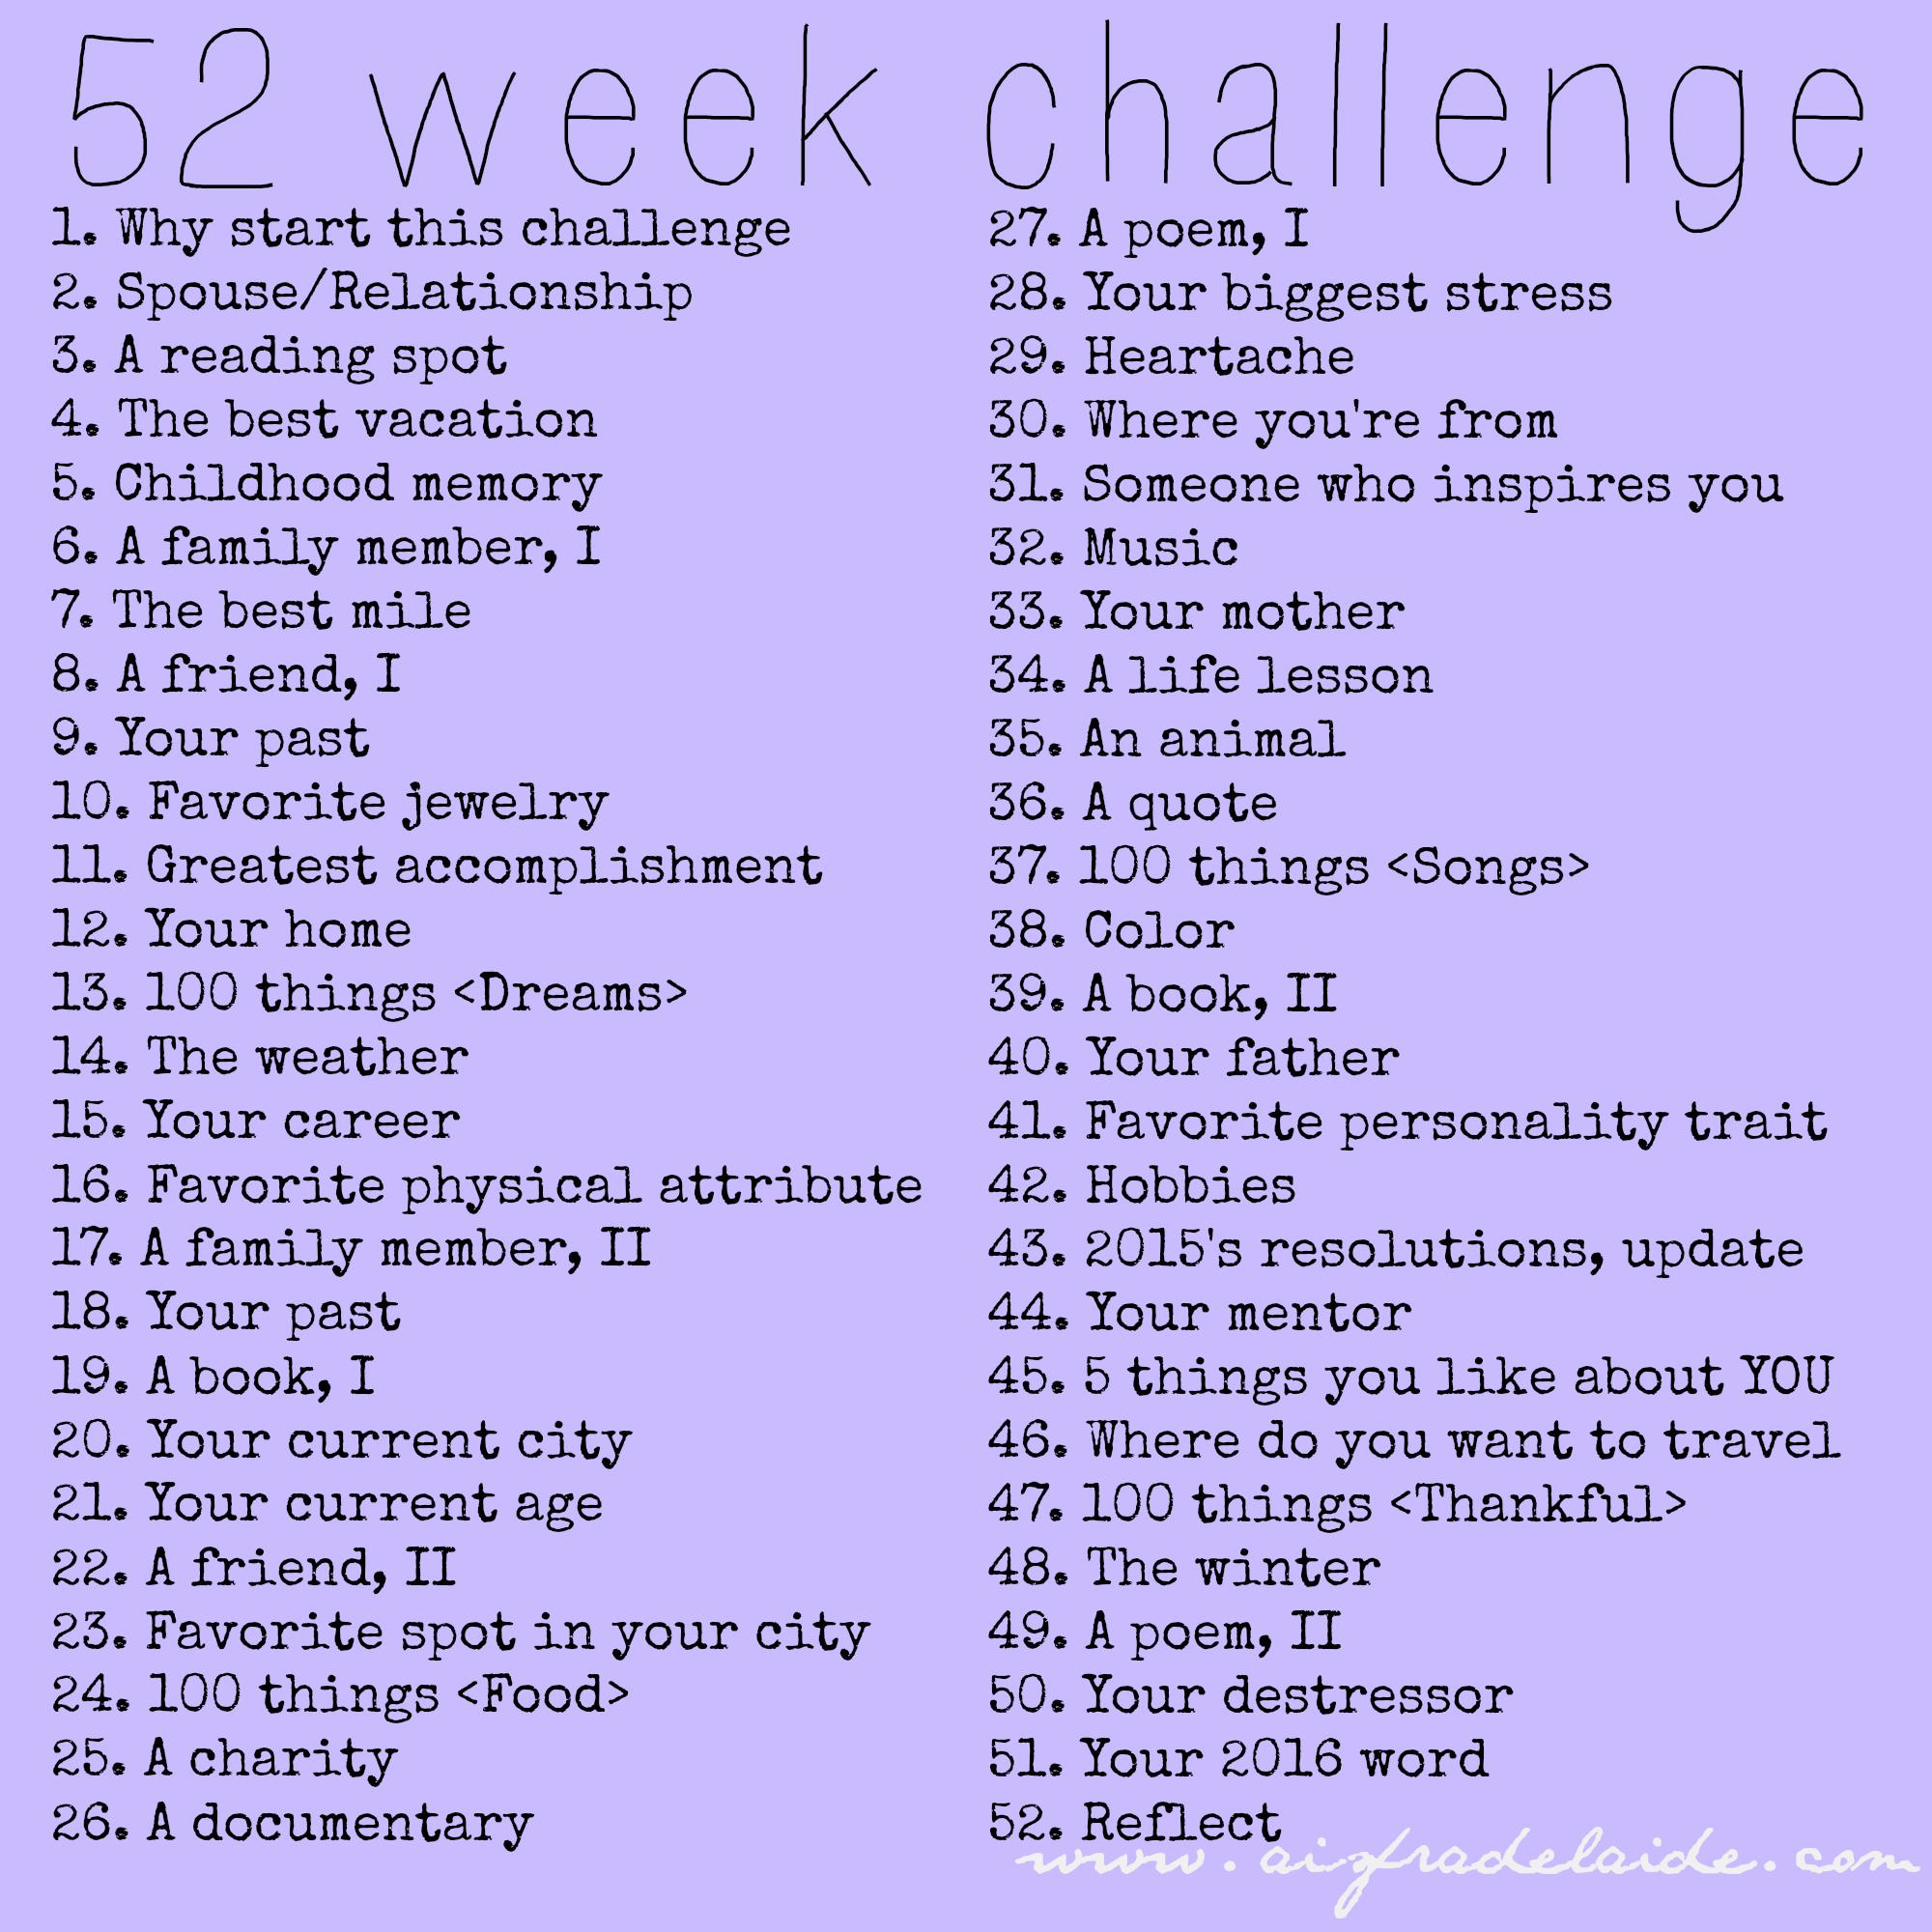 #52WeeksA4A #52weekchallenge 52 week challenge aisforadelaide